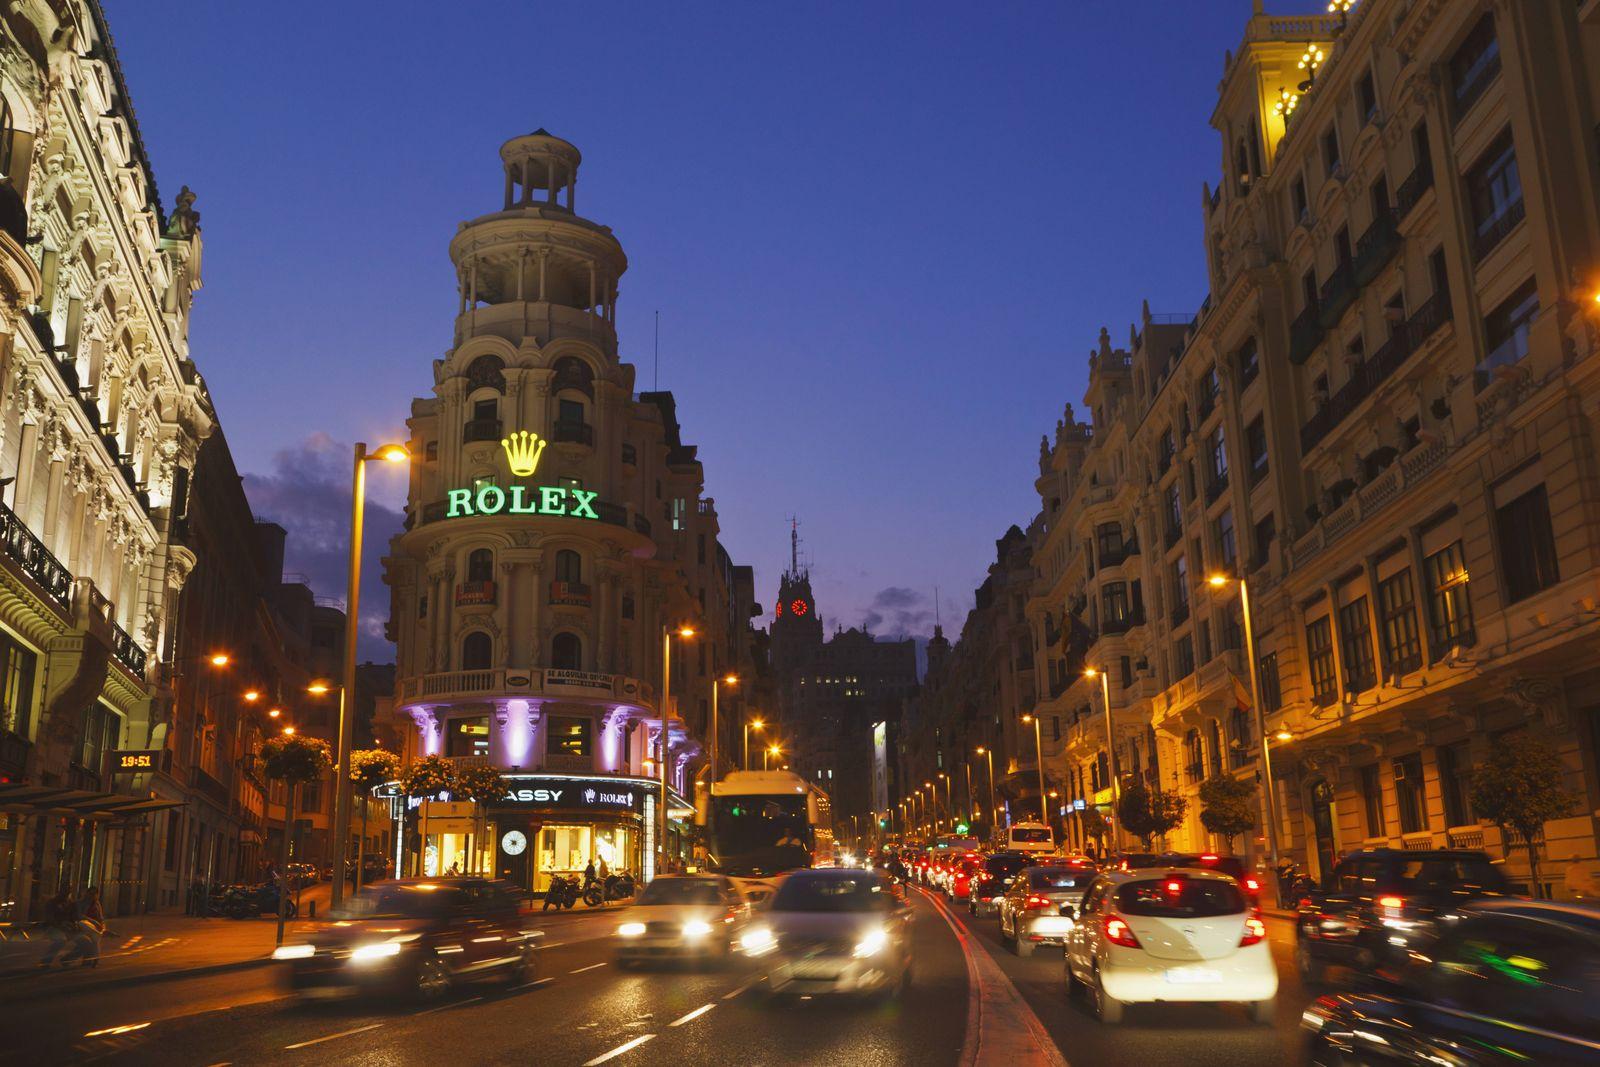 Gran Via At Night Madrid Spain PUBLICATIONxINxGERxSUIxAUTxONLY Copyright KenxWelsh 2076532